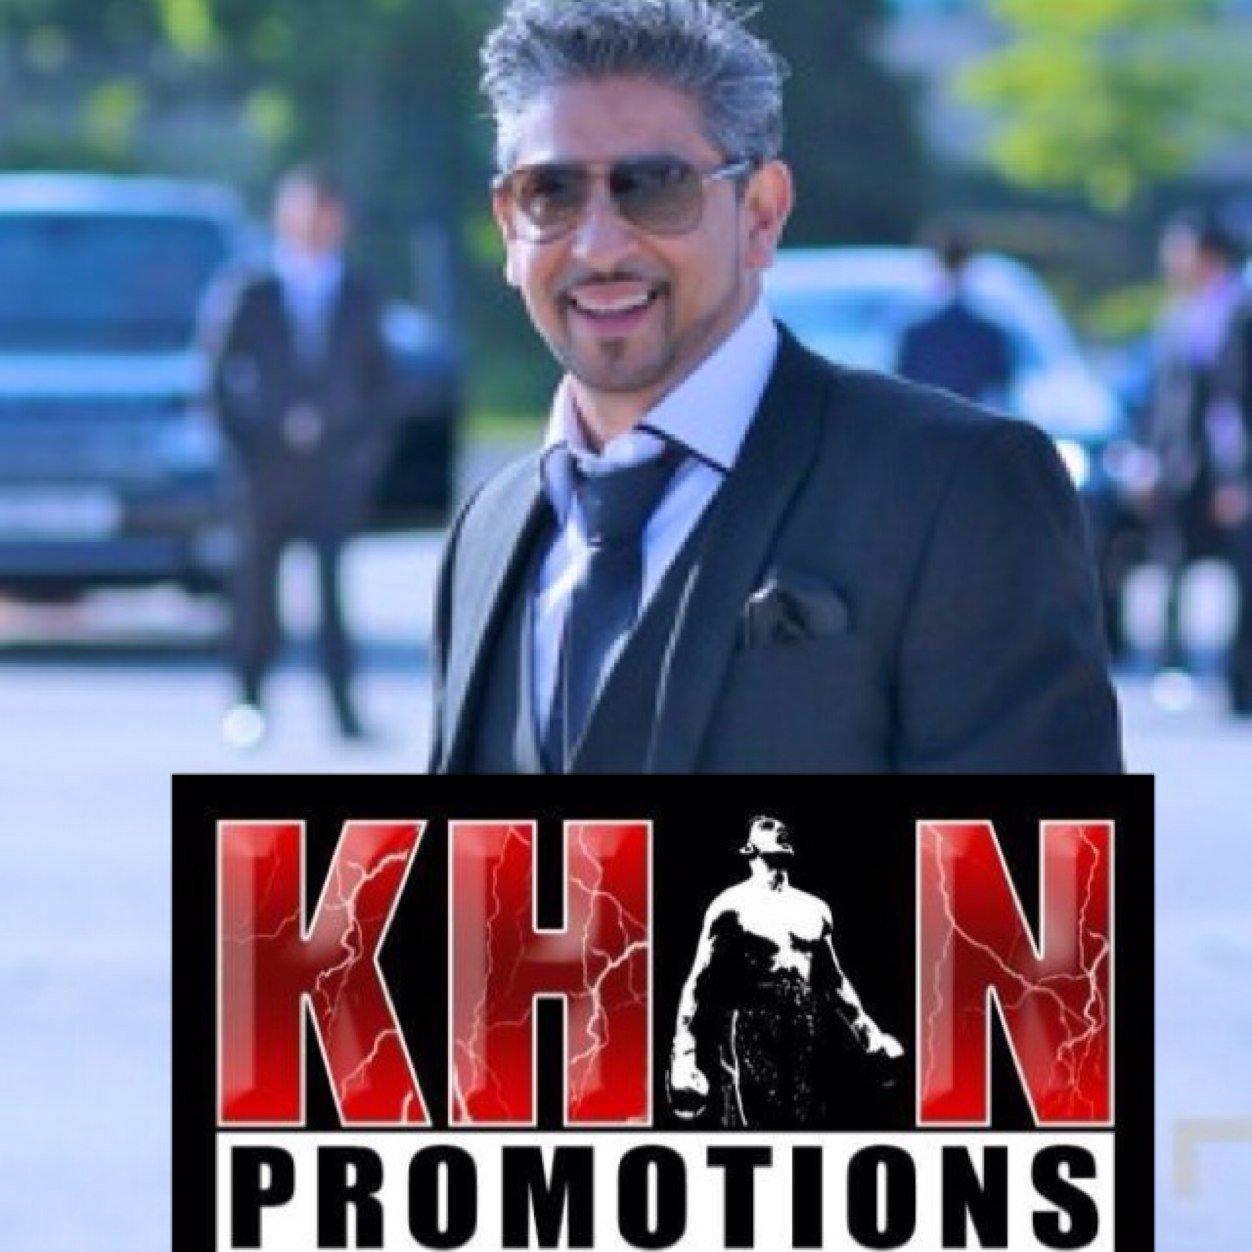 Khan Promotions Social Profile